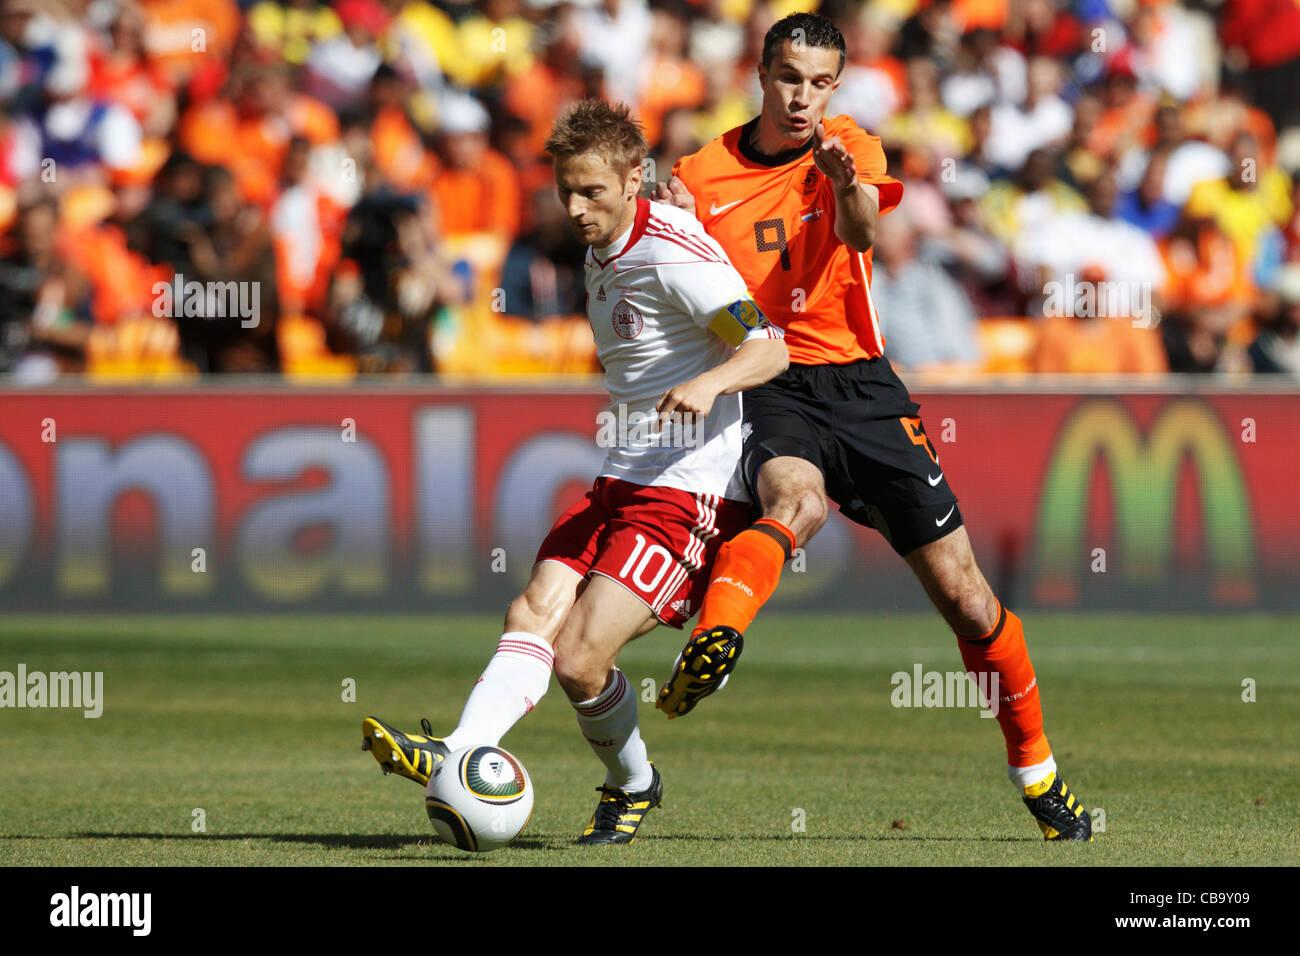 Robin van Persie of the Netherlands (R) pressures Denmark team captain Martin Jorgensen (L) during a 2010 World - Stock Image